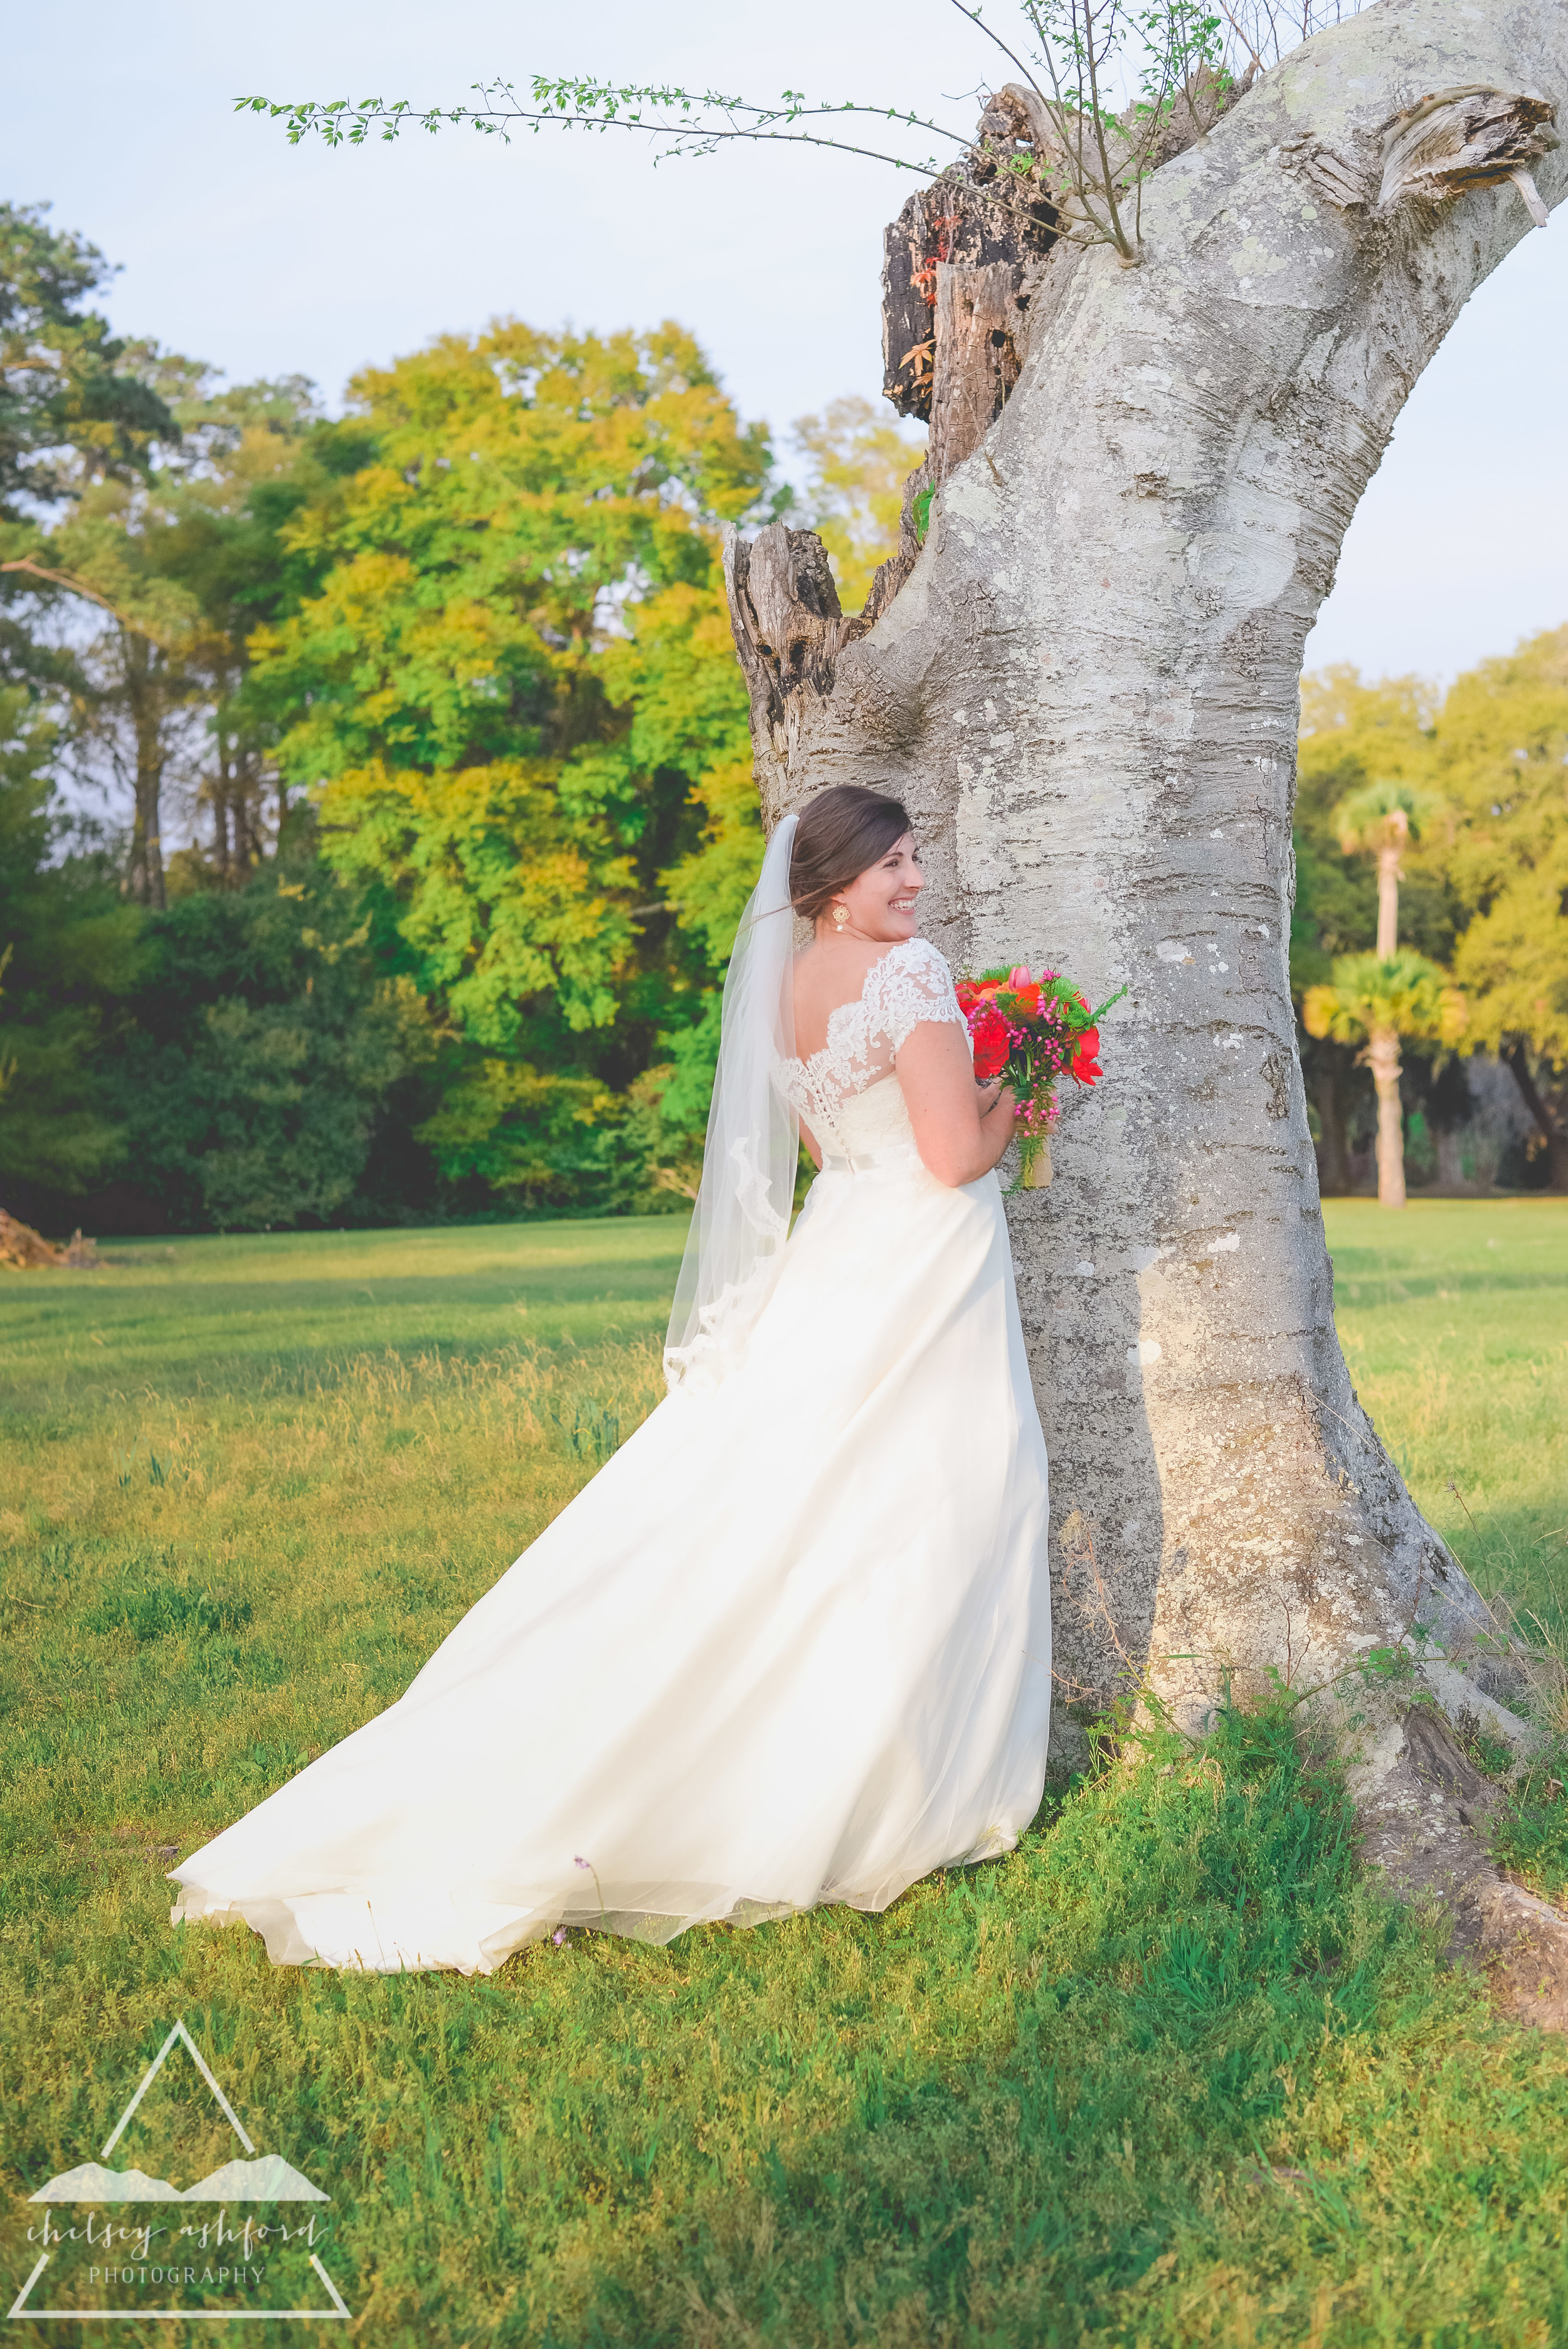 Sylvia_bridals_web-41.jpg